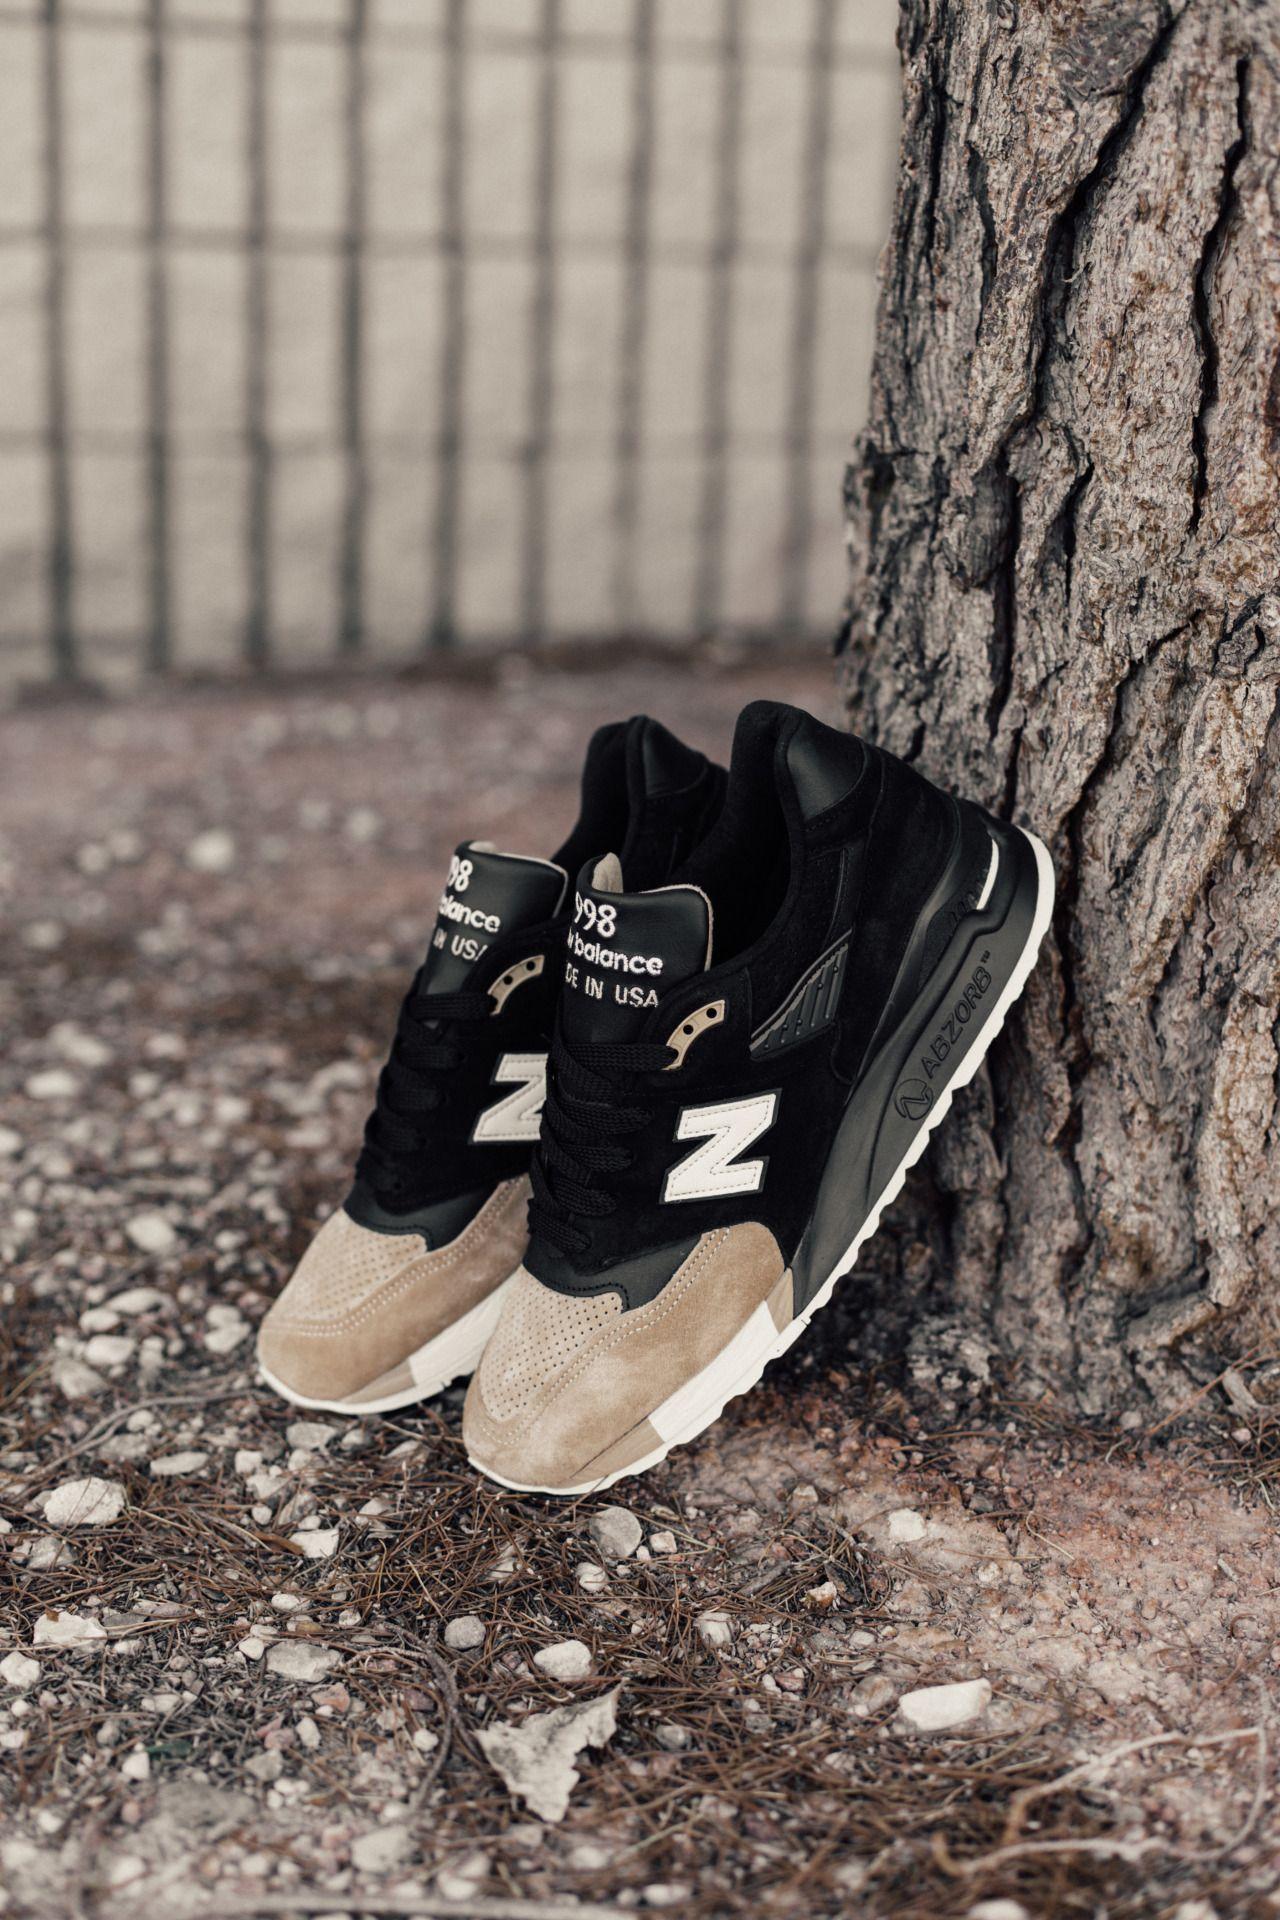 new balance 998 prmr black beige x premier